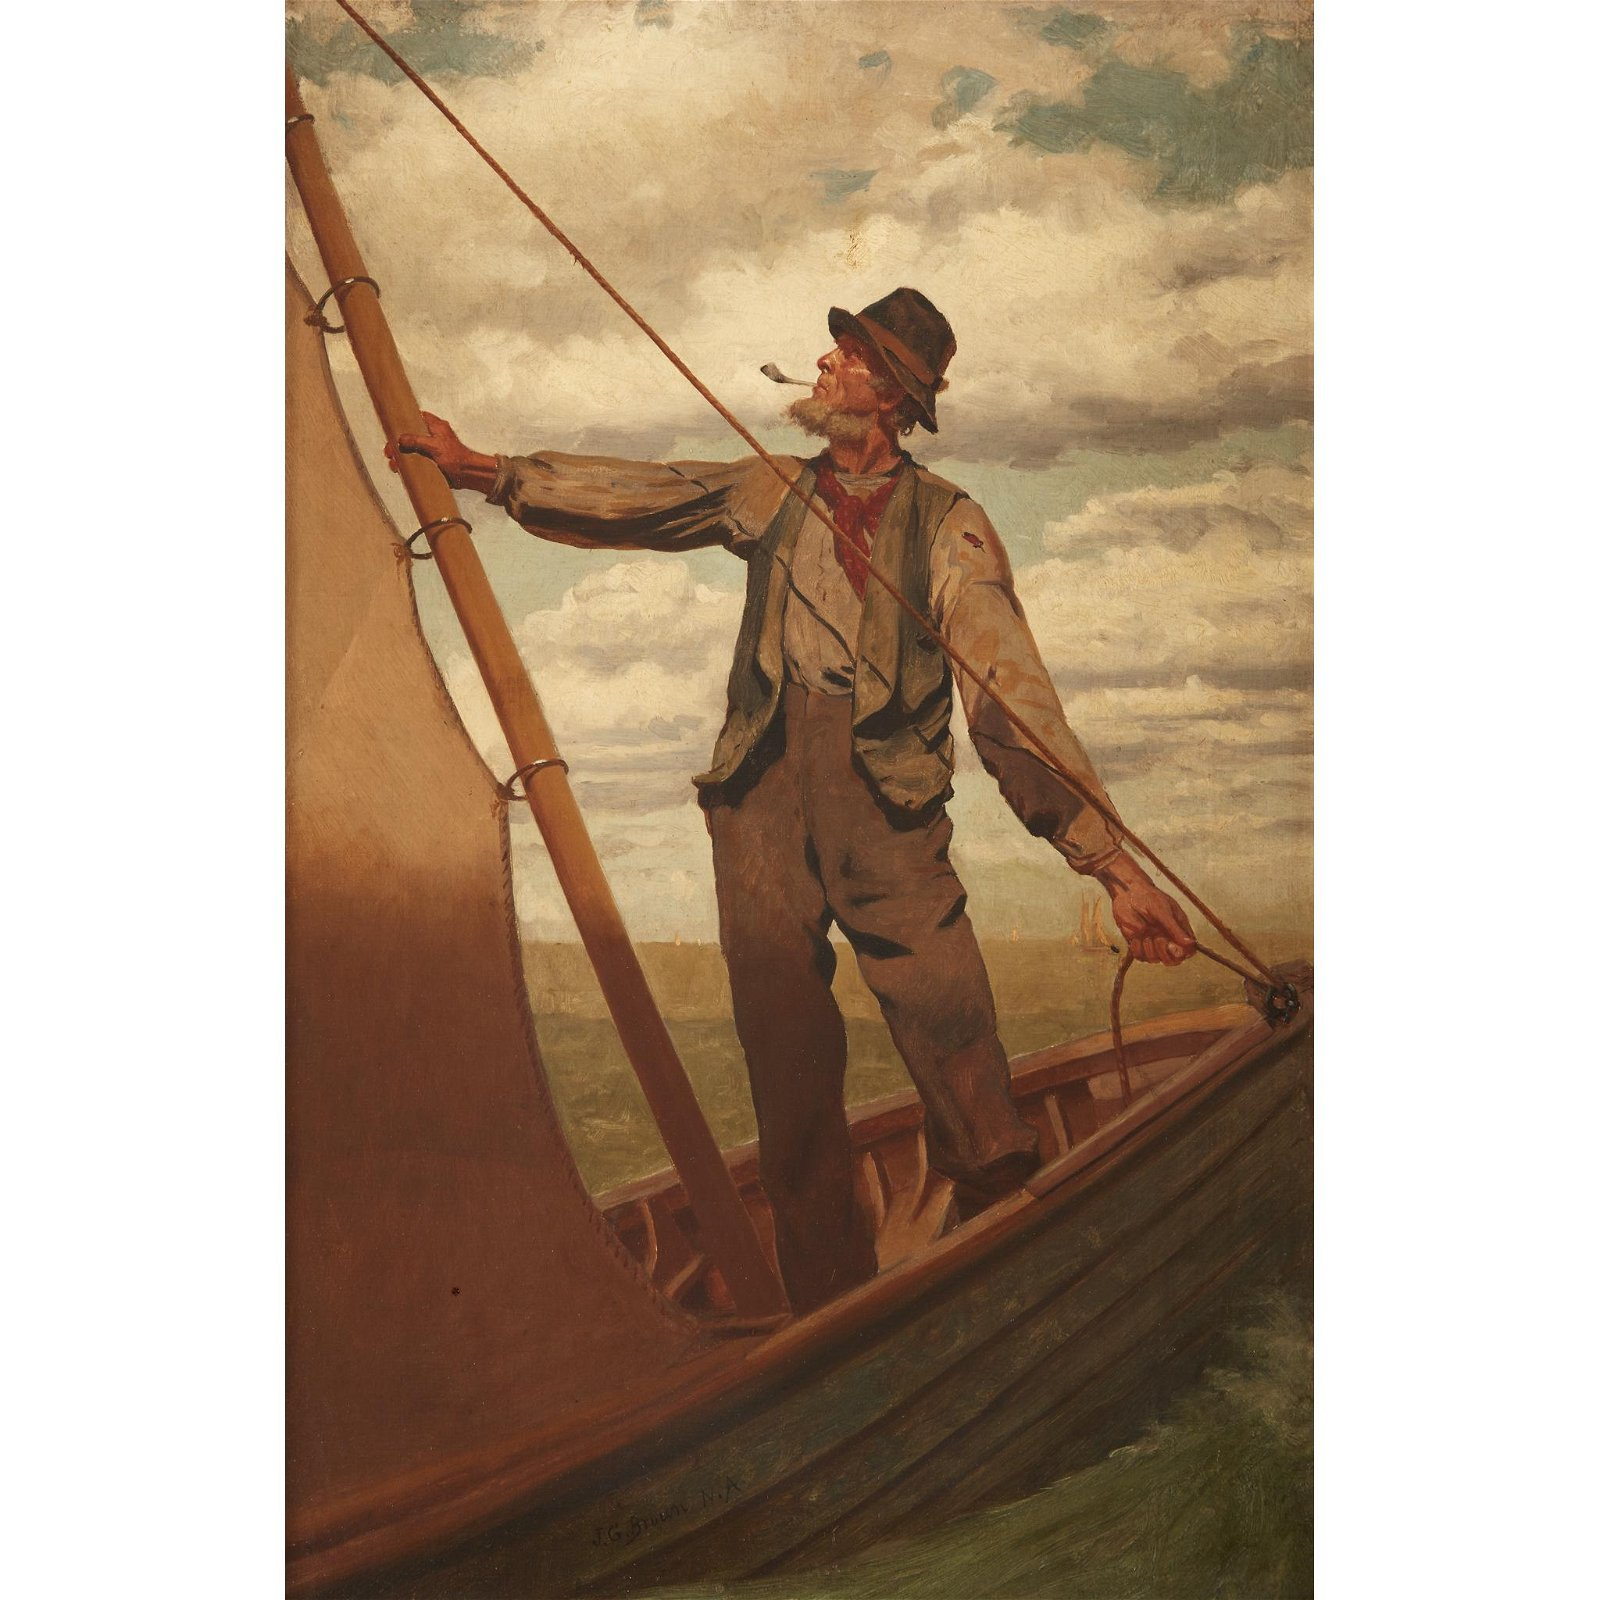 John George Brown (American, 1831-1913), , Hoisting the